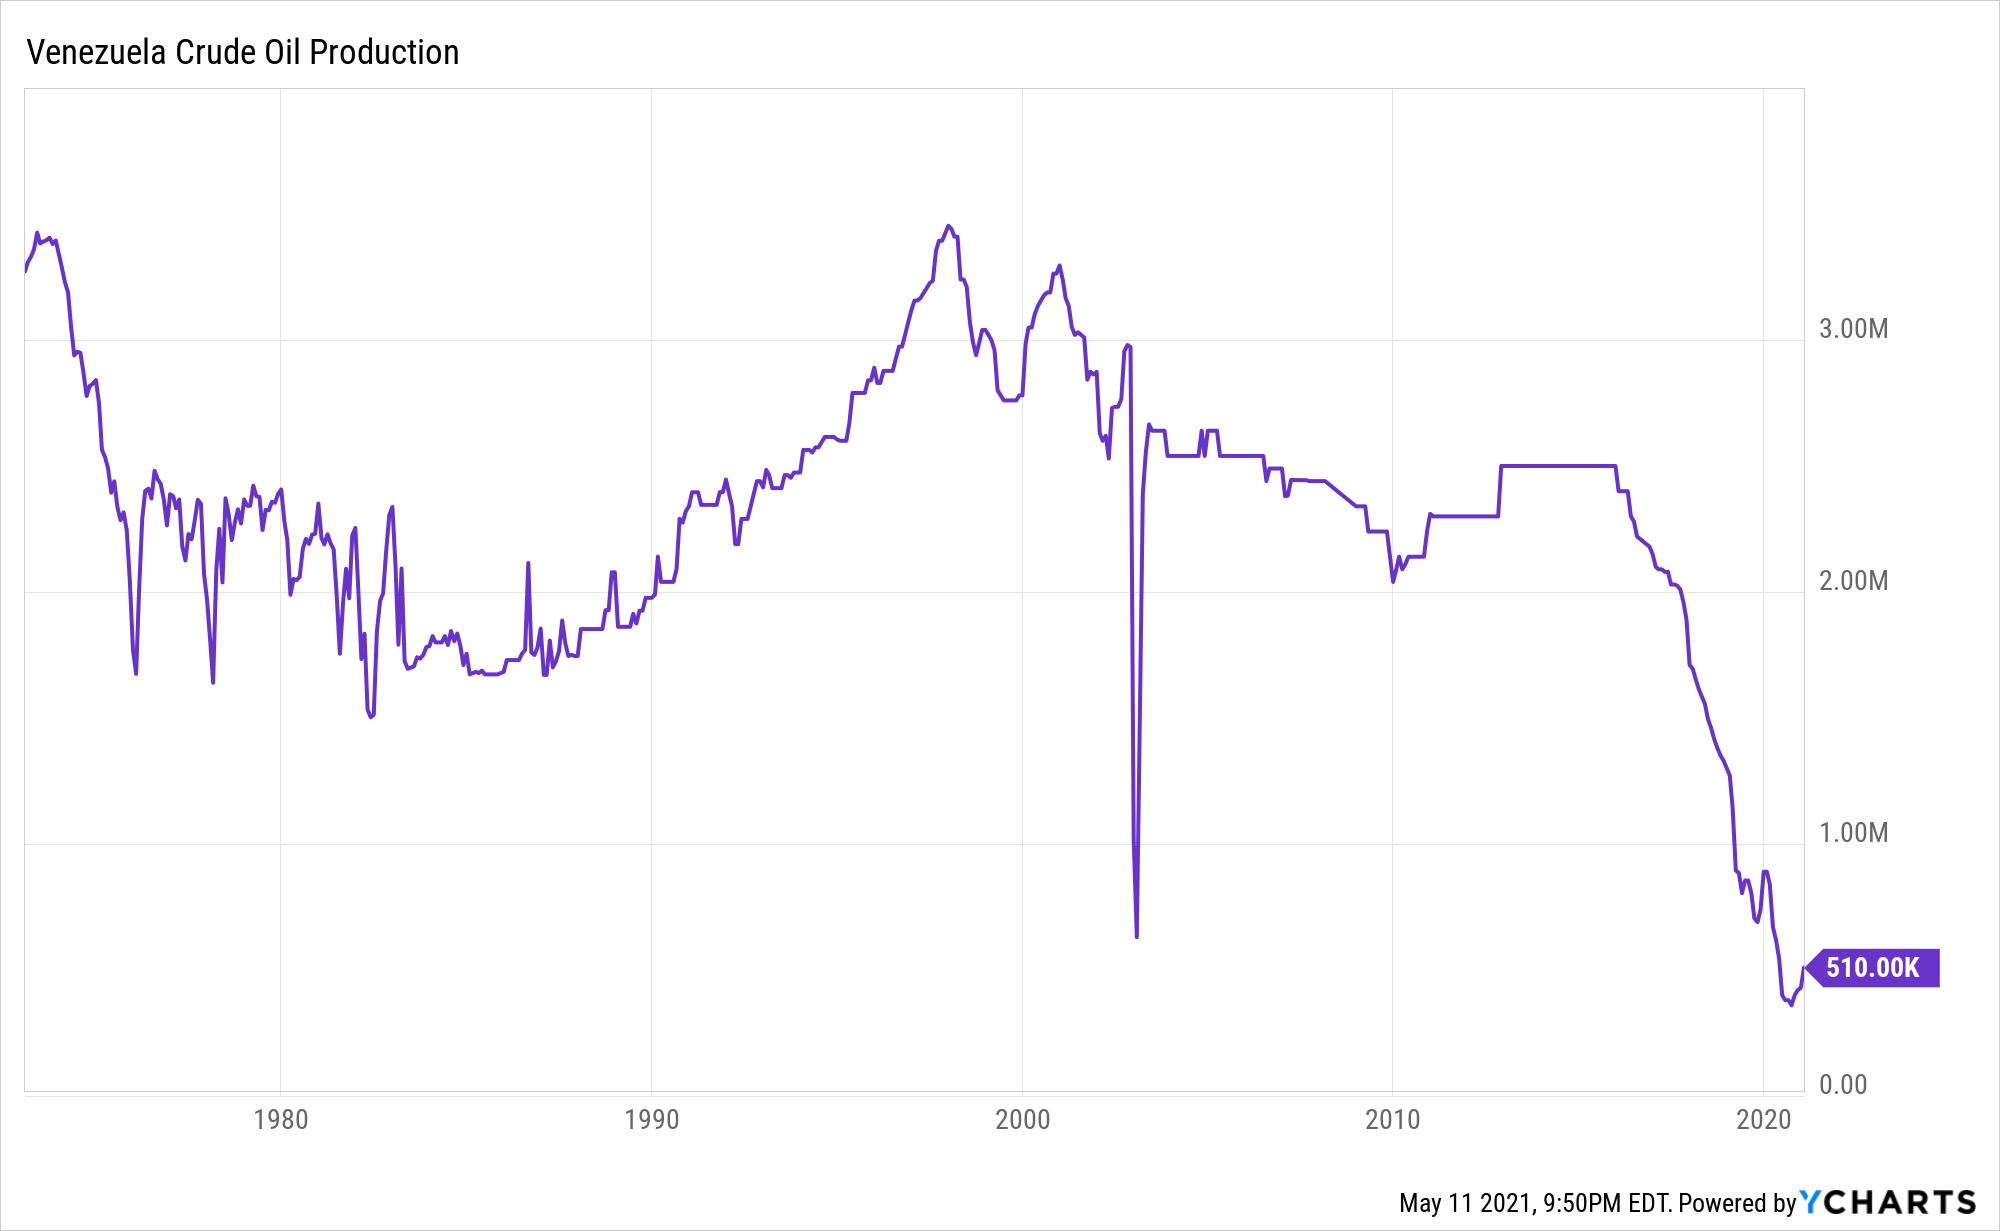 Venezuela Crude Oil Production Chart